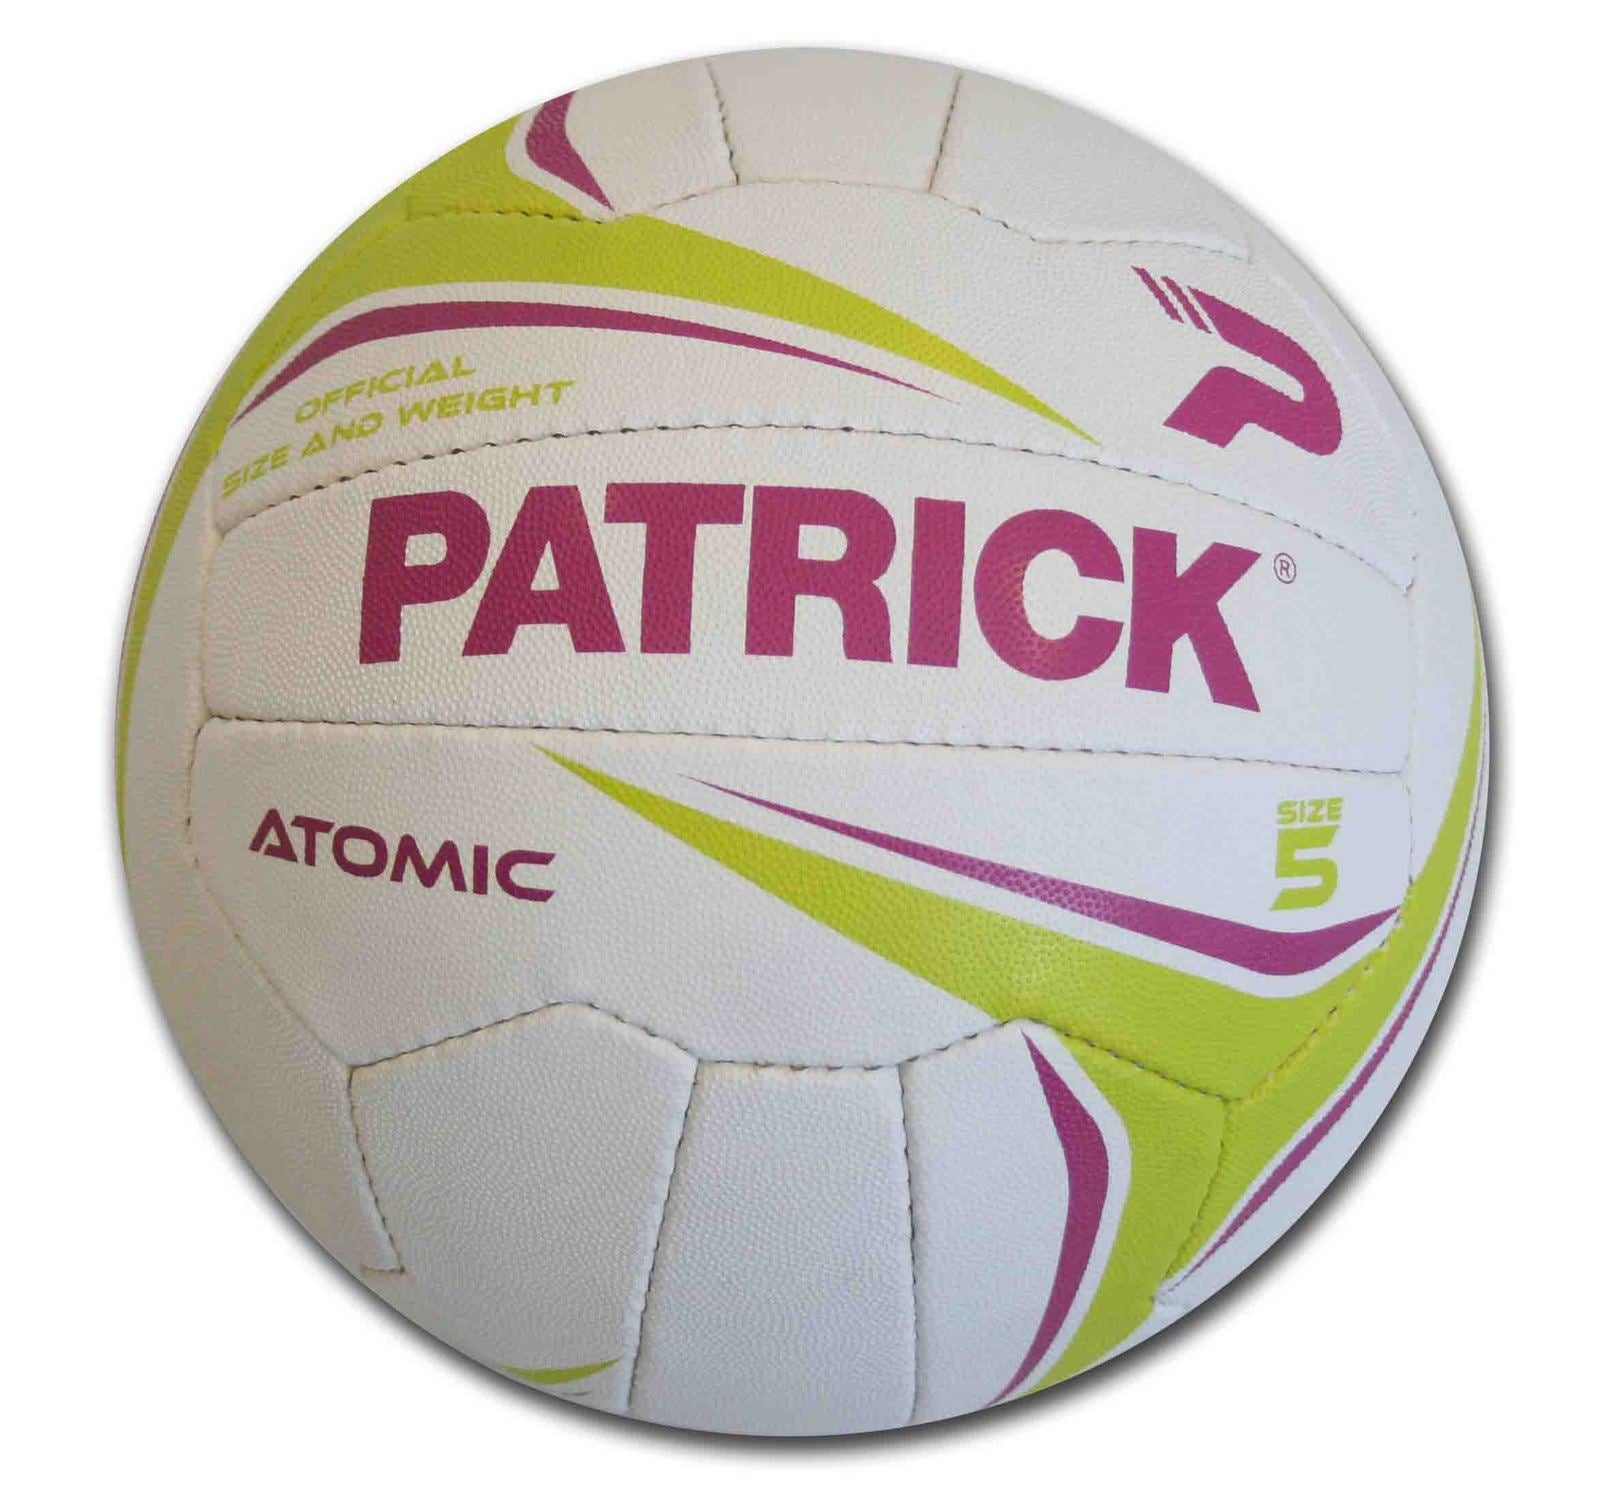 PATRICK ATOMIC NETBALL - VULCANISED RUBBER COVER - SIZES 4 / 5